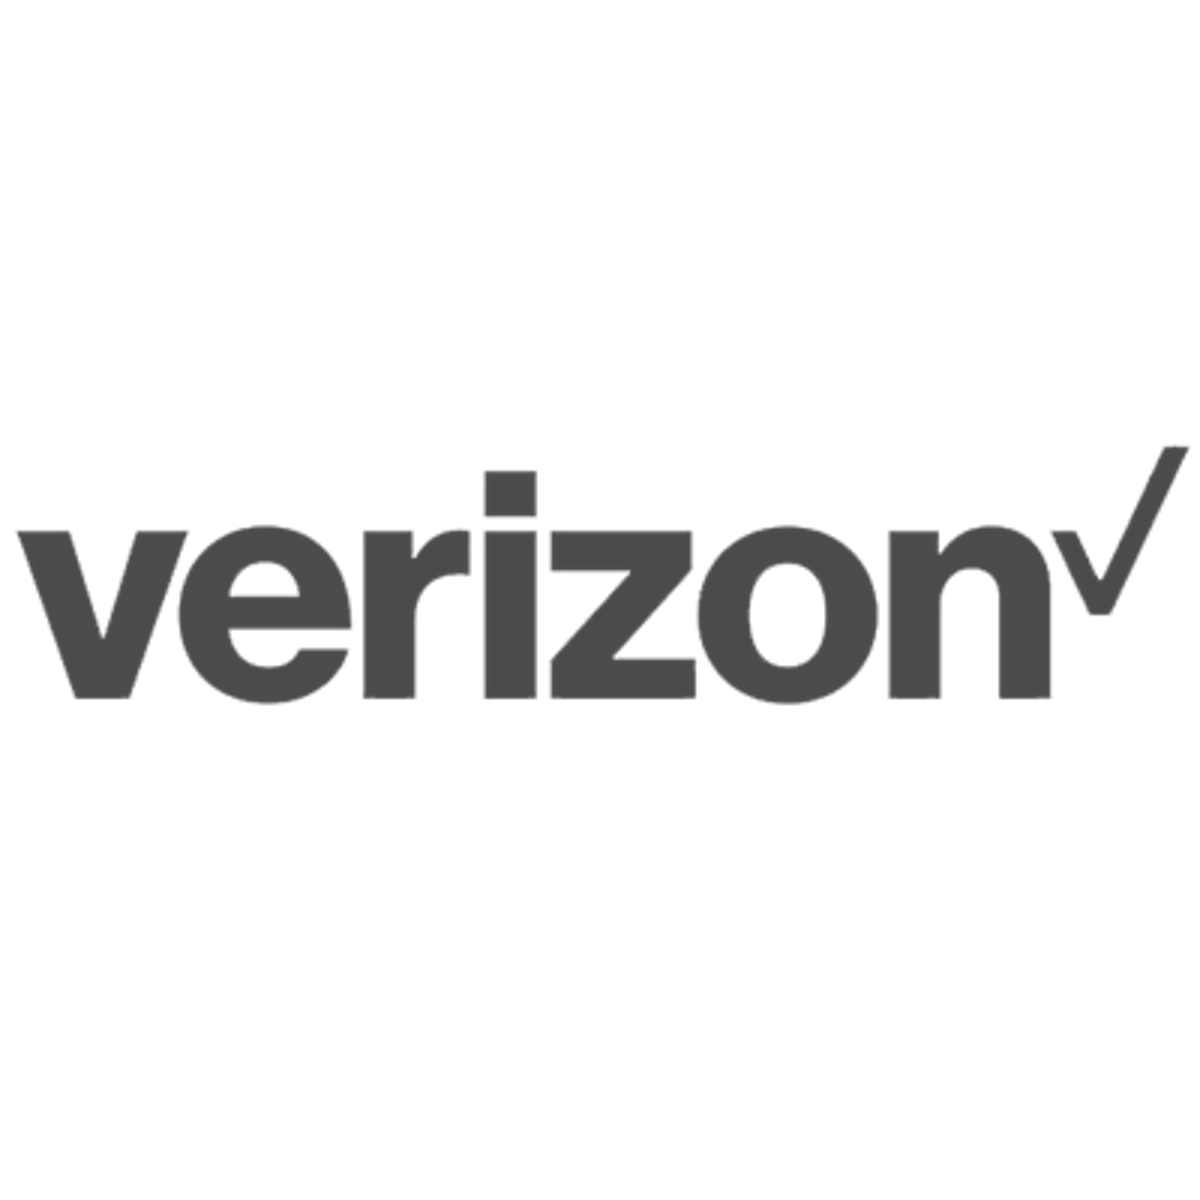 Verizon Fios1 Campus Protein